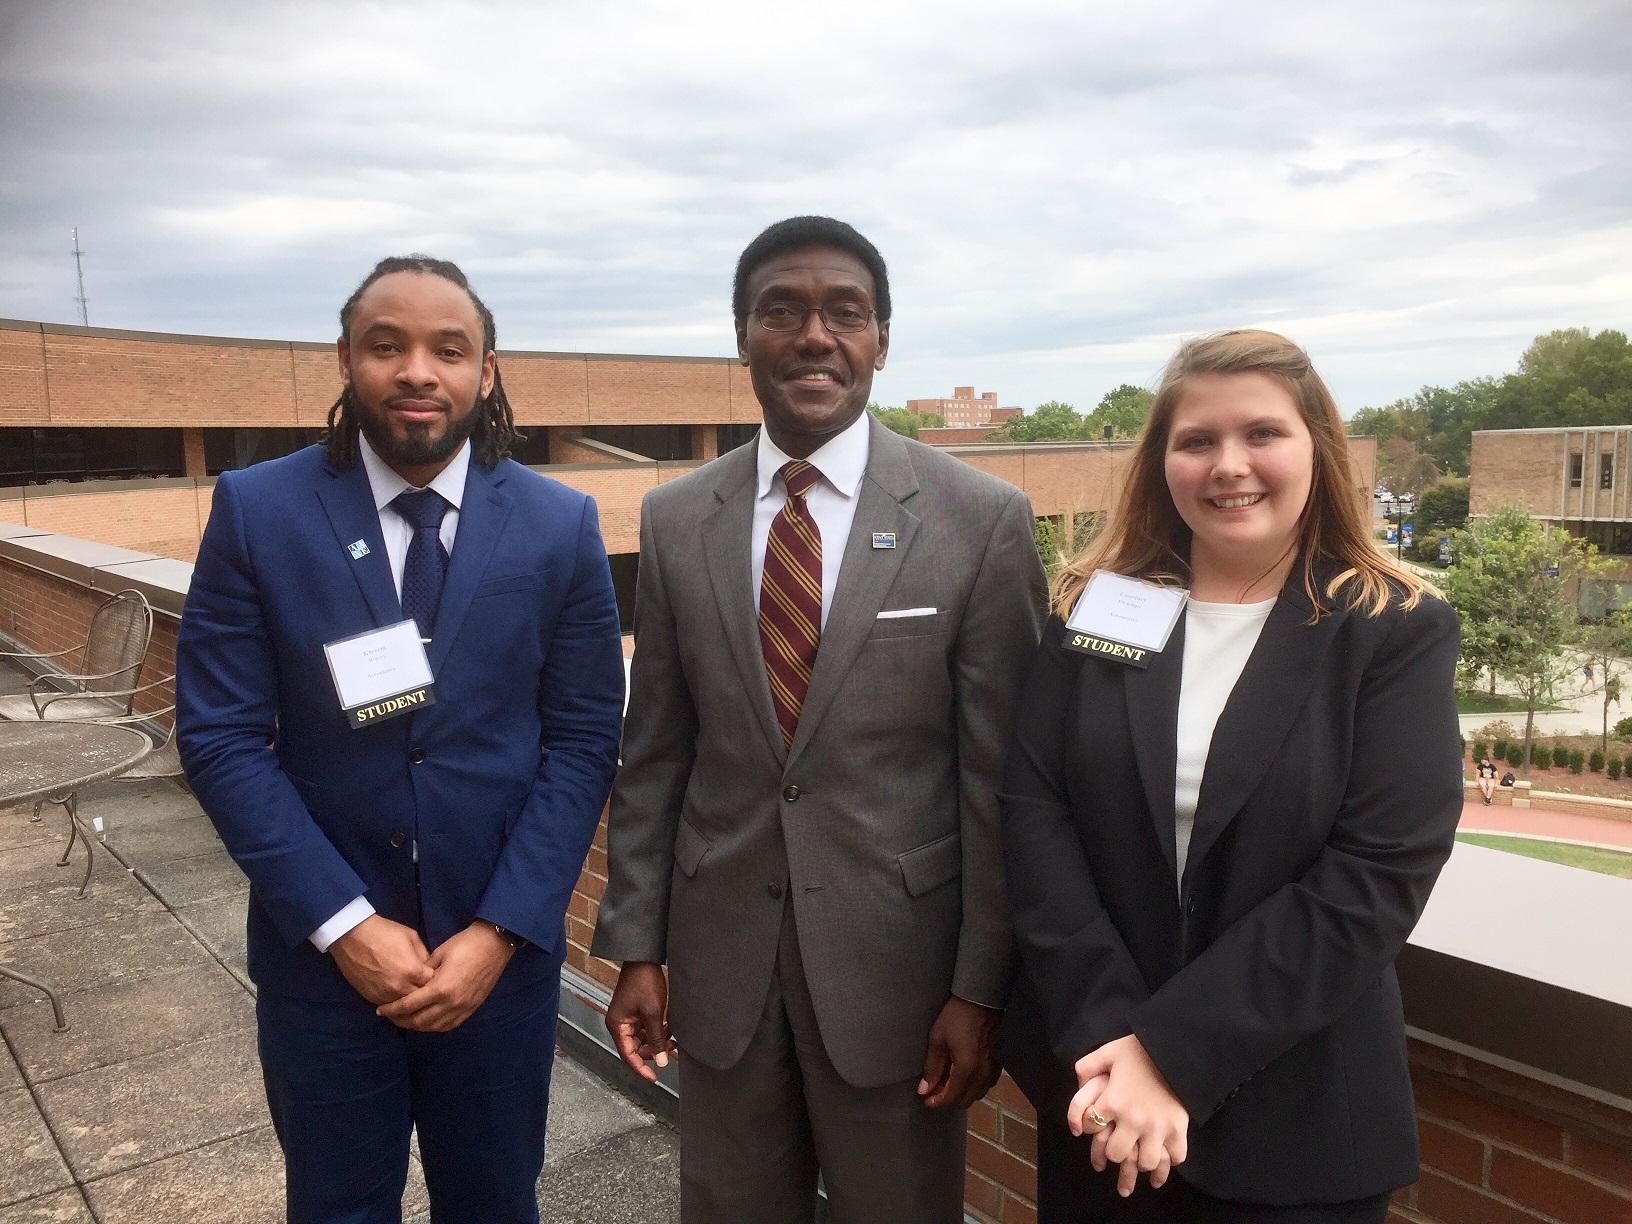 photo Kareem Rogers, Dr. Nettey, Courtney Flickinger SURE Award Ceremony